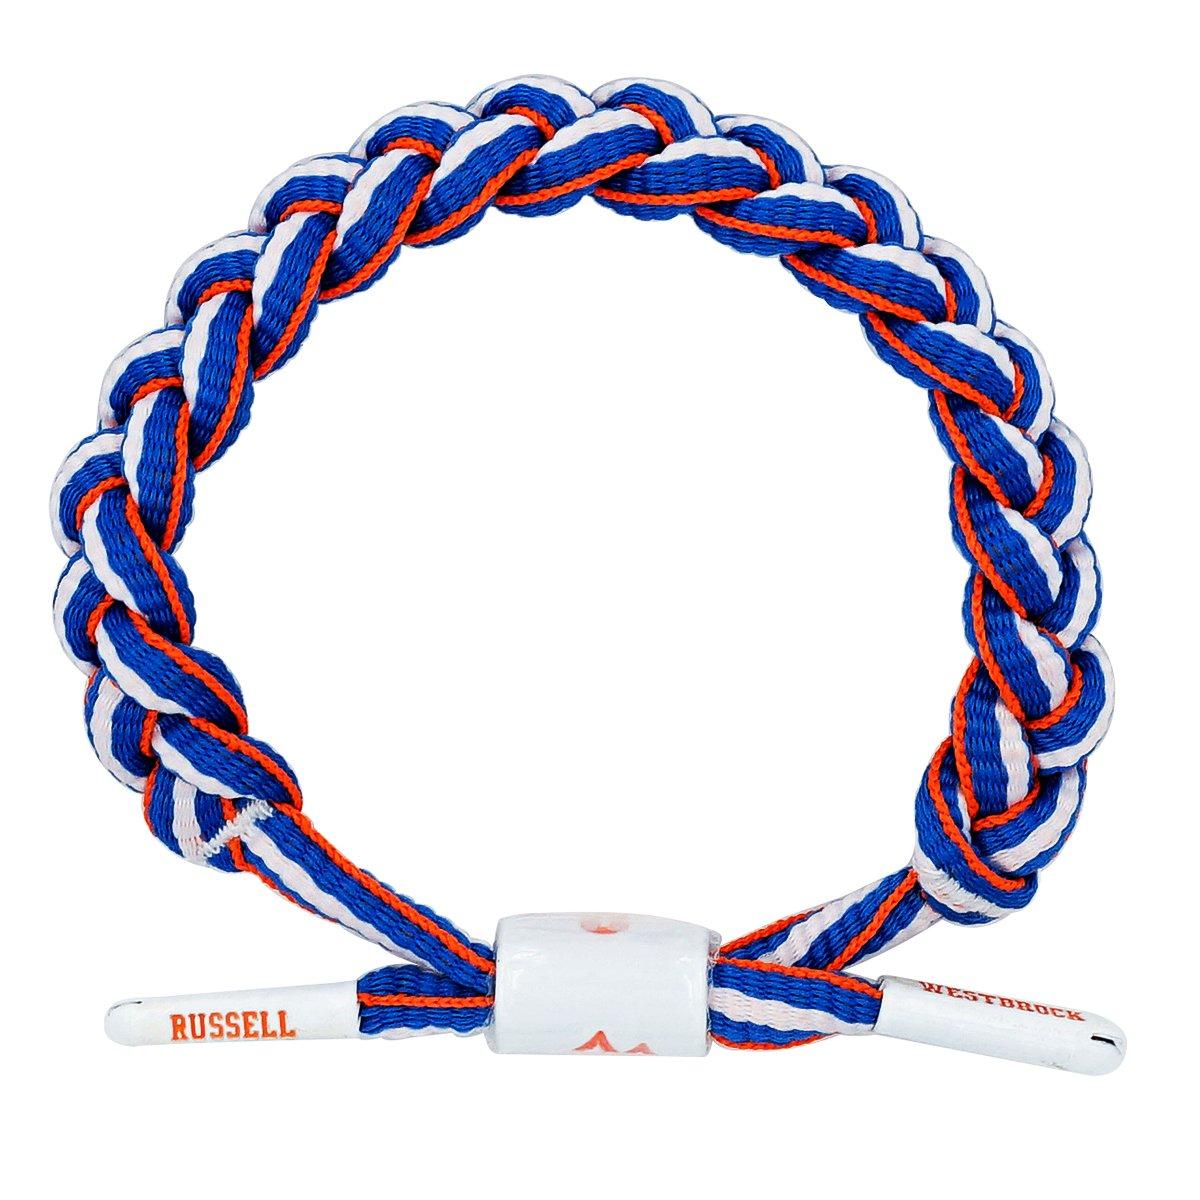 MLFuture Basketball Bracelet Wristband hand knitted adjustable bracelet NBA Player Collection WESTBROCK by MLFuture